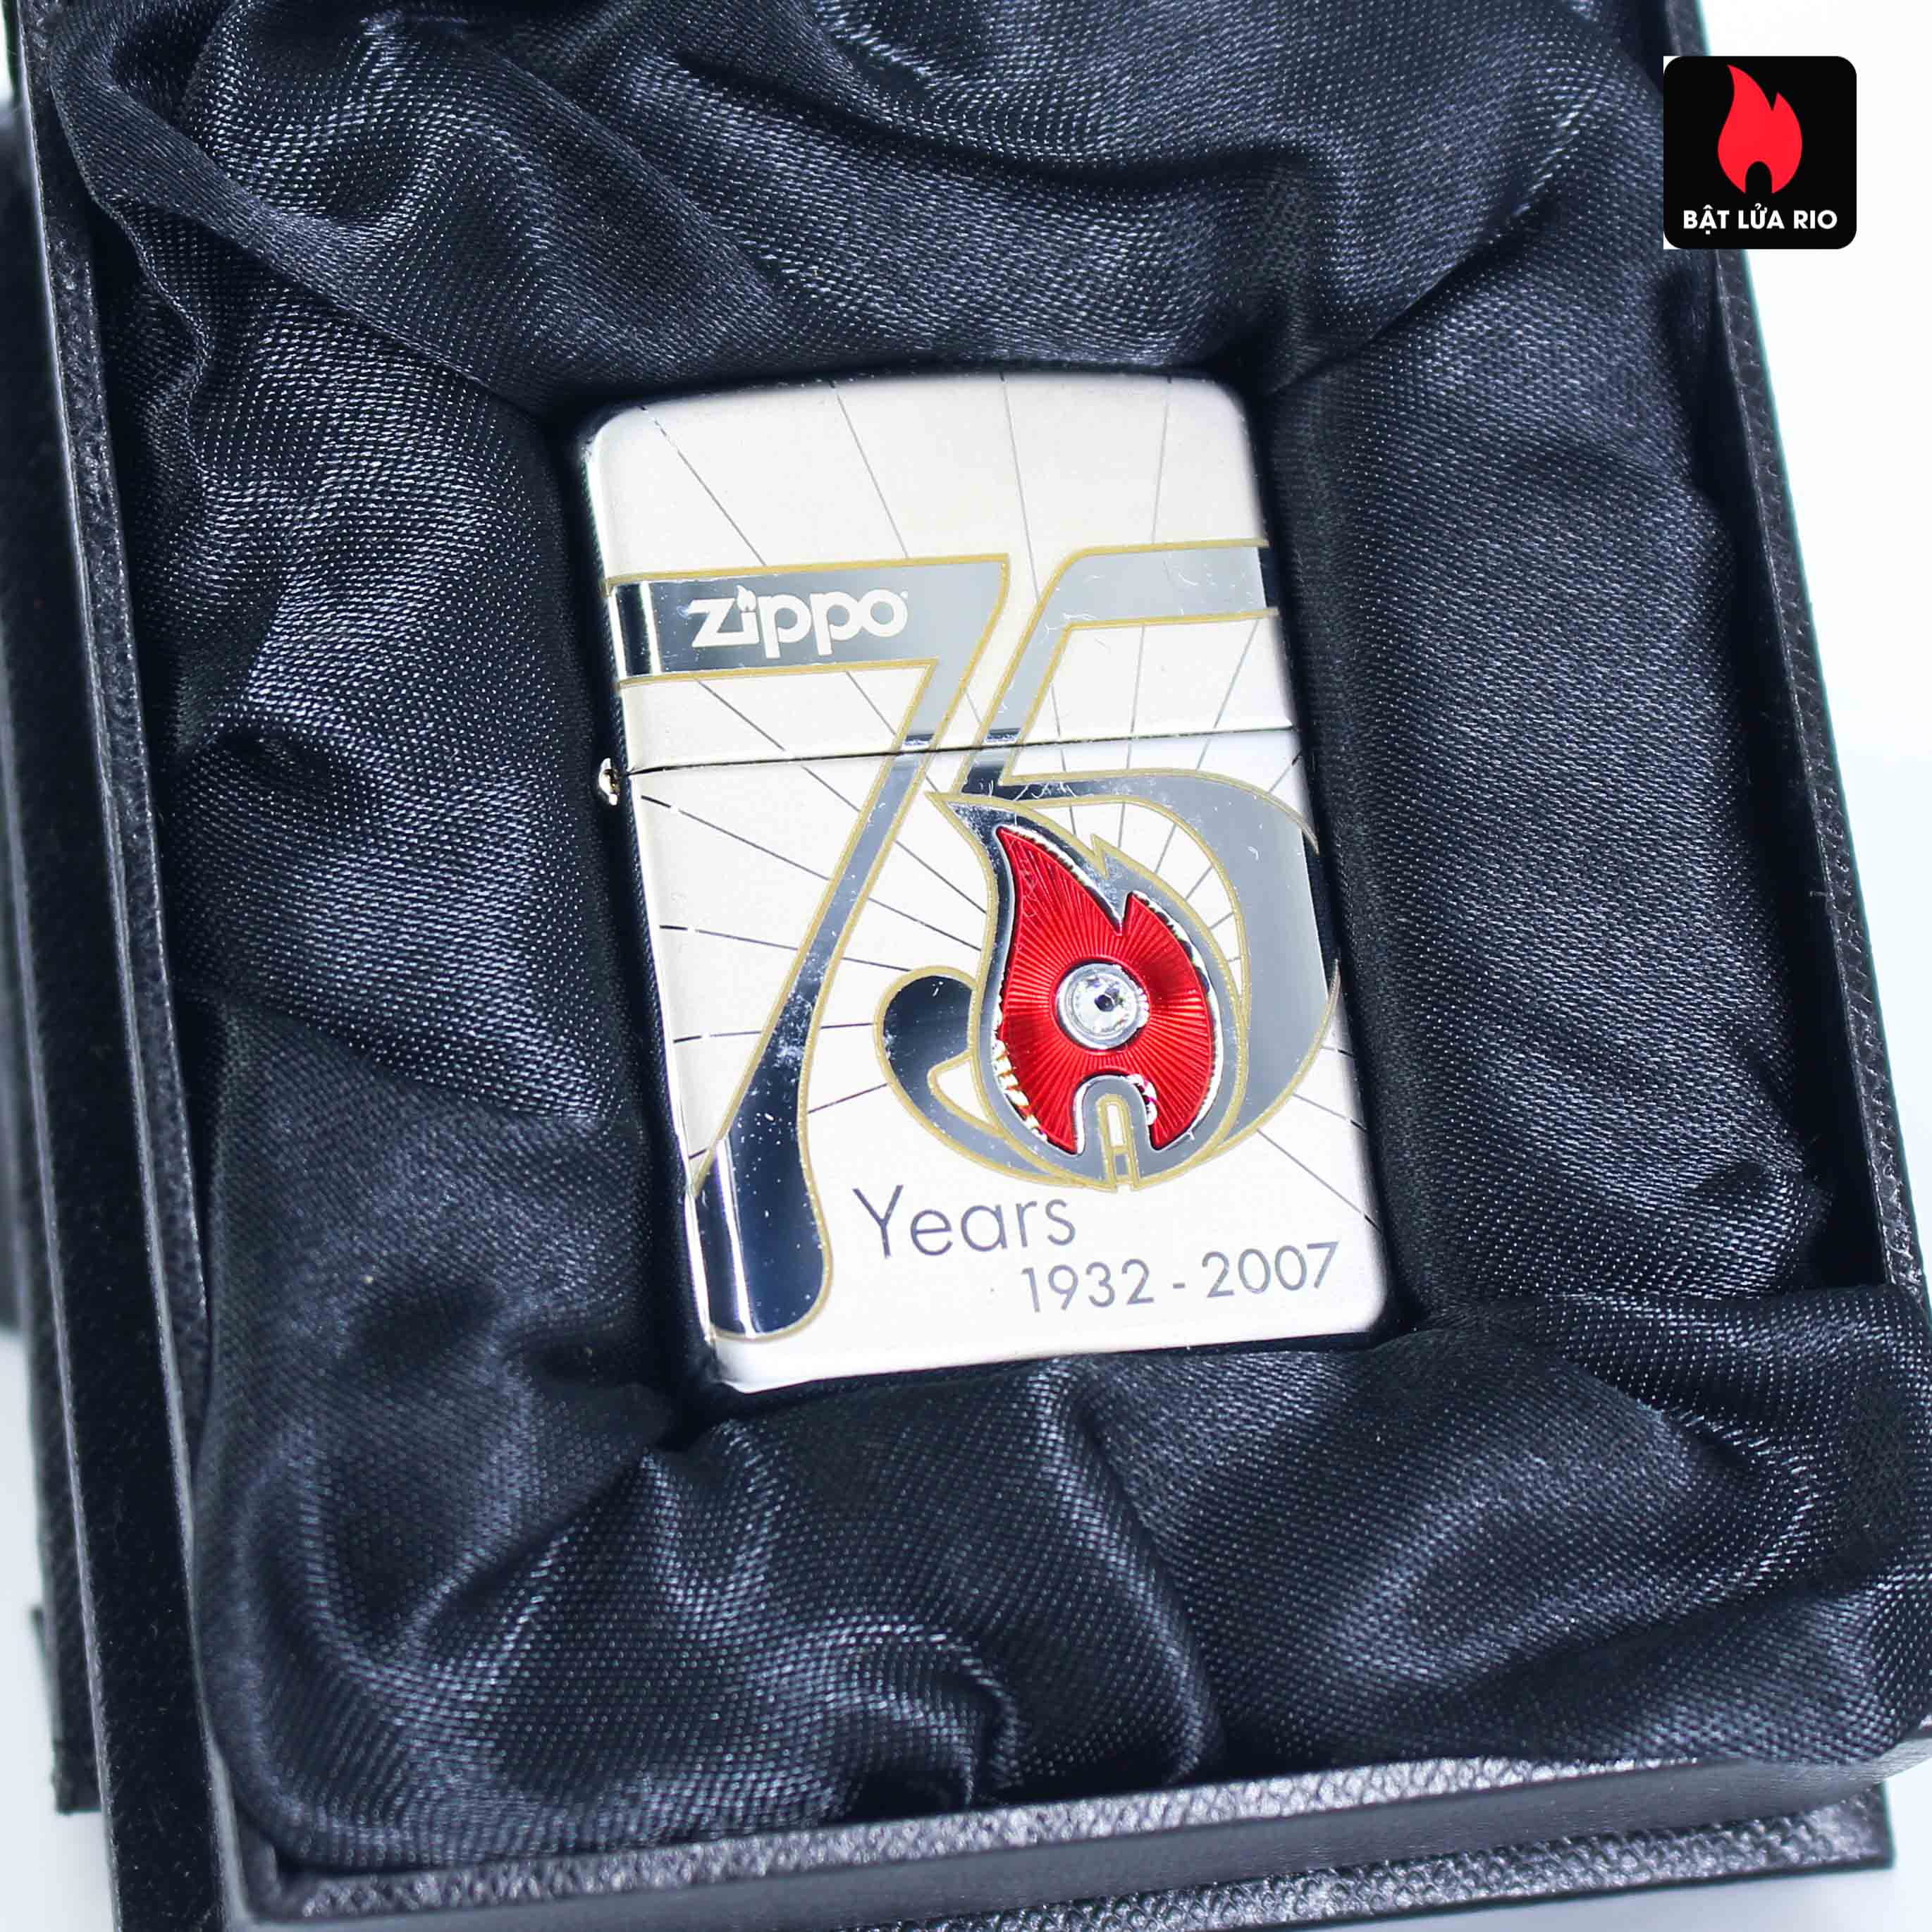 Zippo 2007 – 75th Anniversary Edition – United Kingdom – Limited GRB 1 Of 500 1